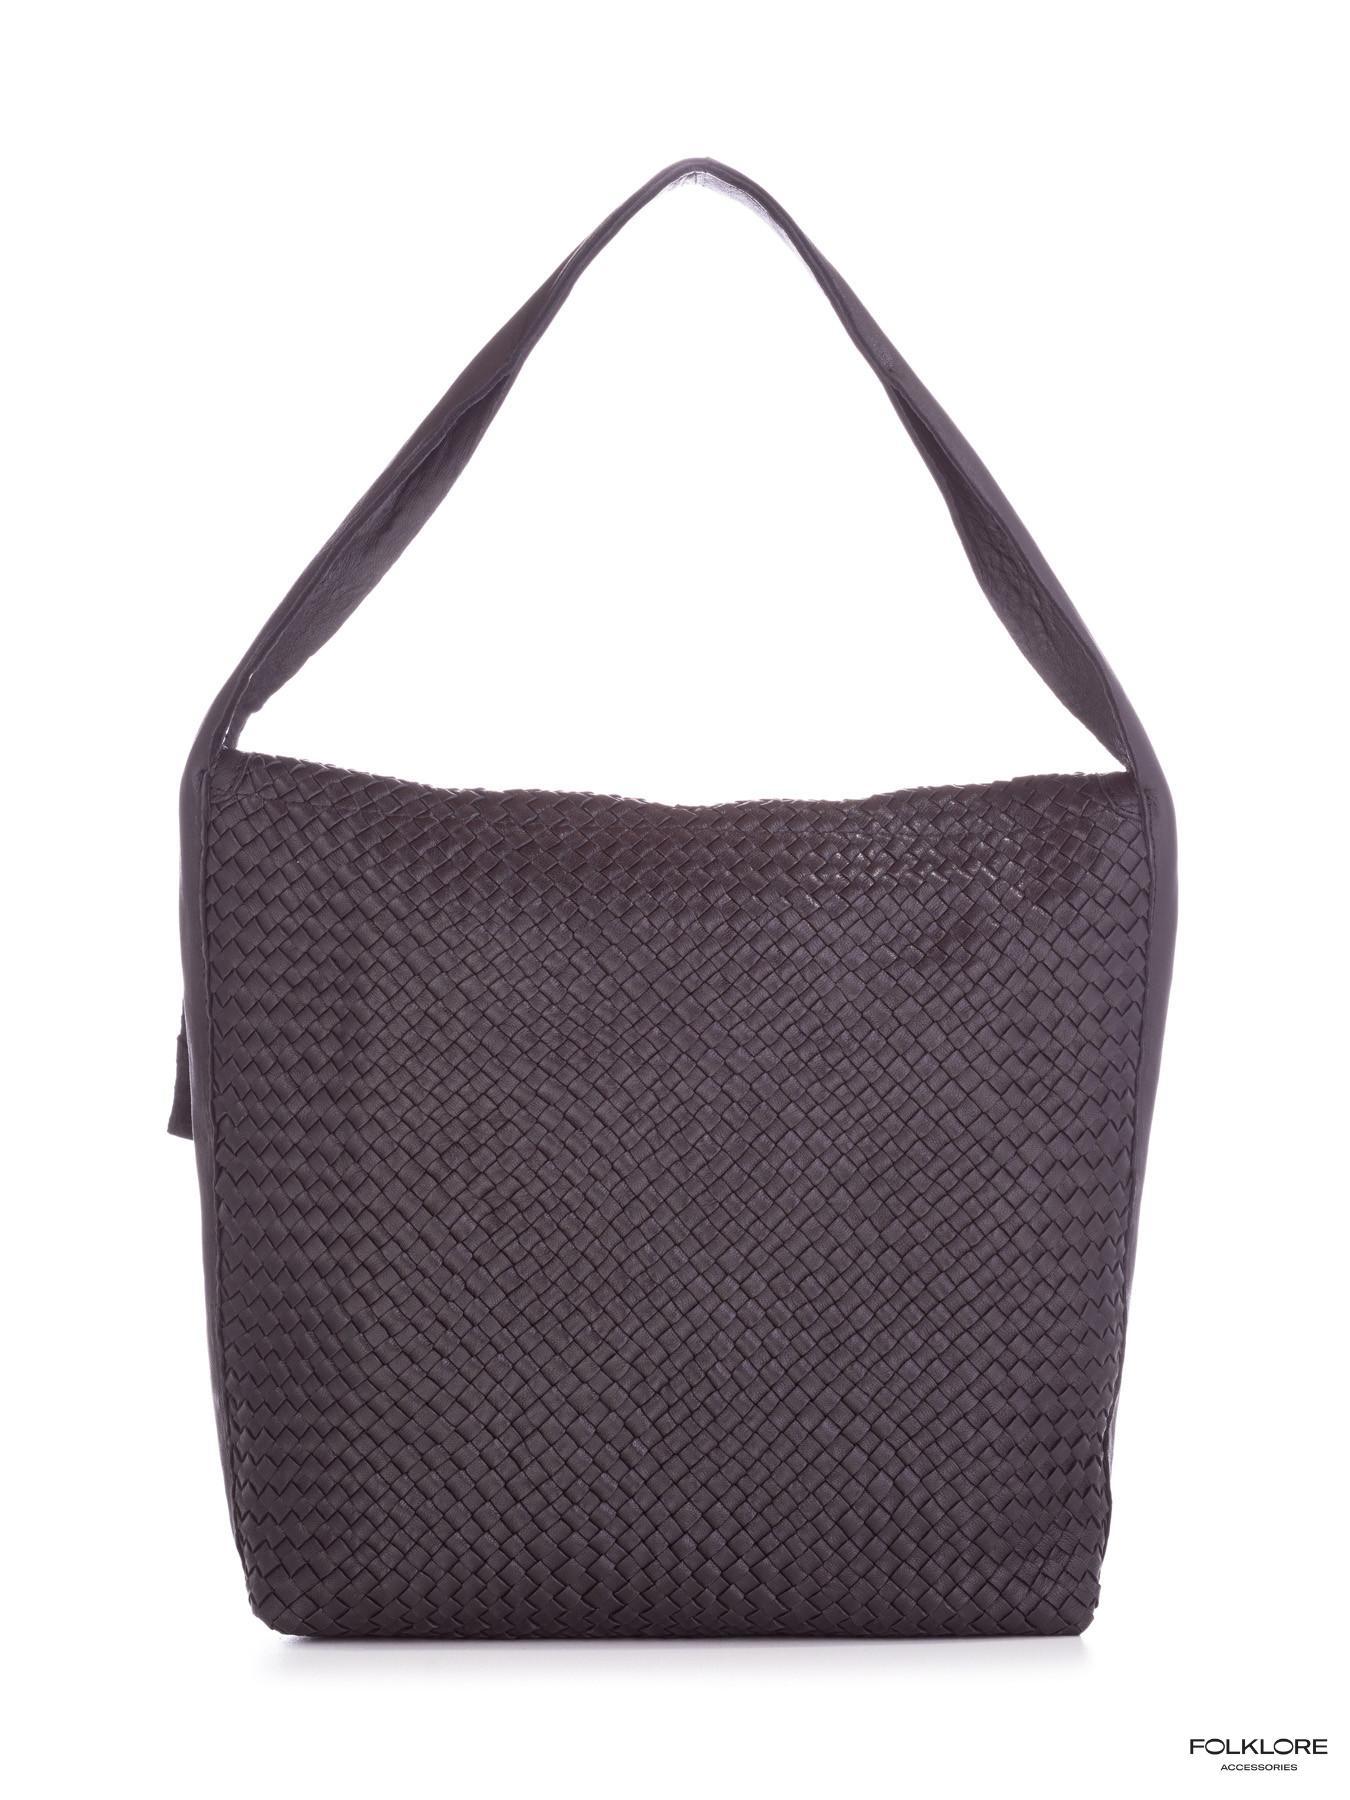 BIBA Lawson Crna kožna ručno pletena tašna